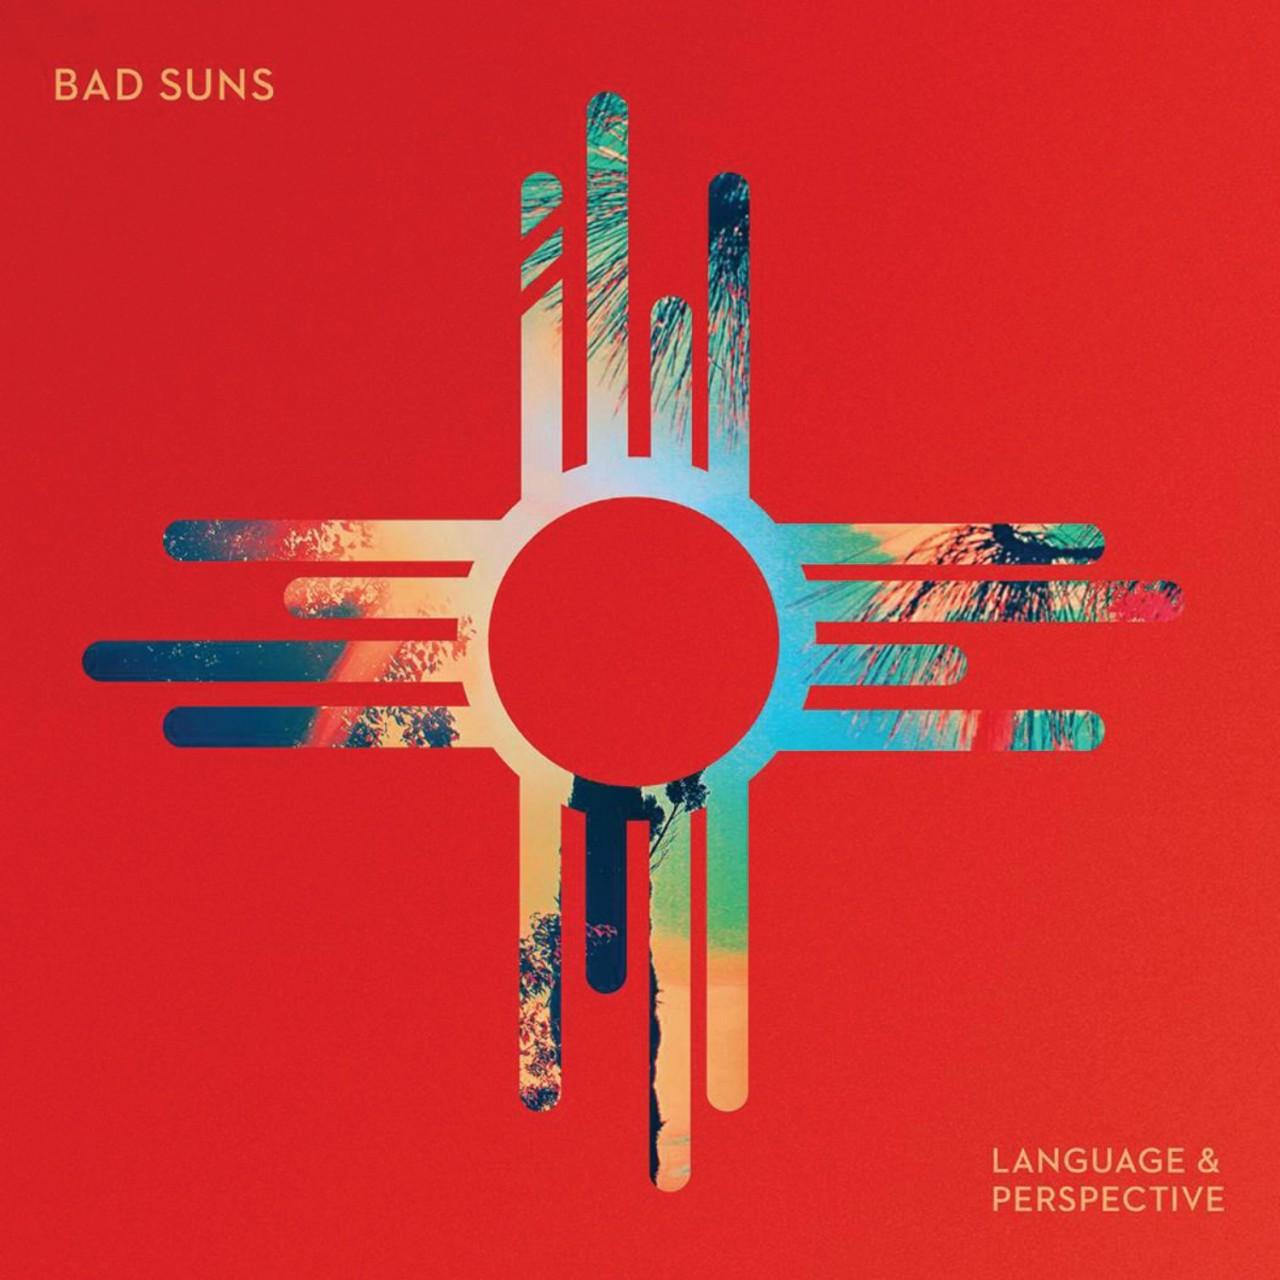 bad suns